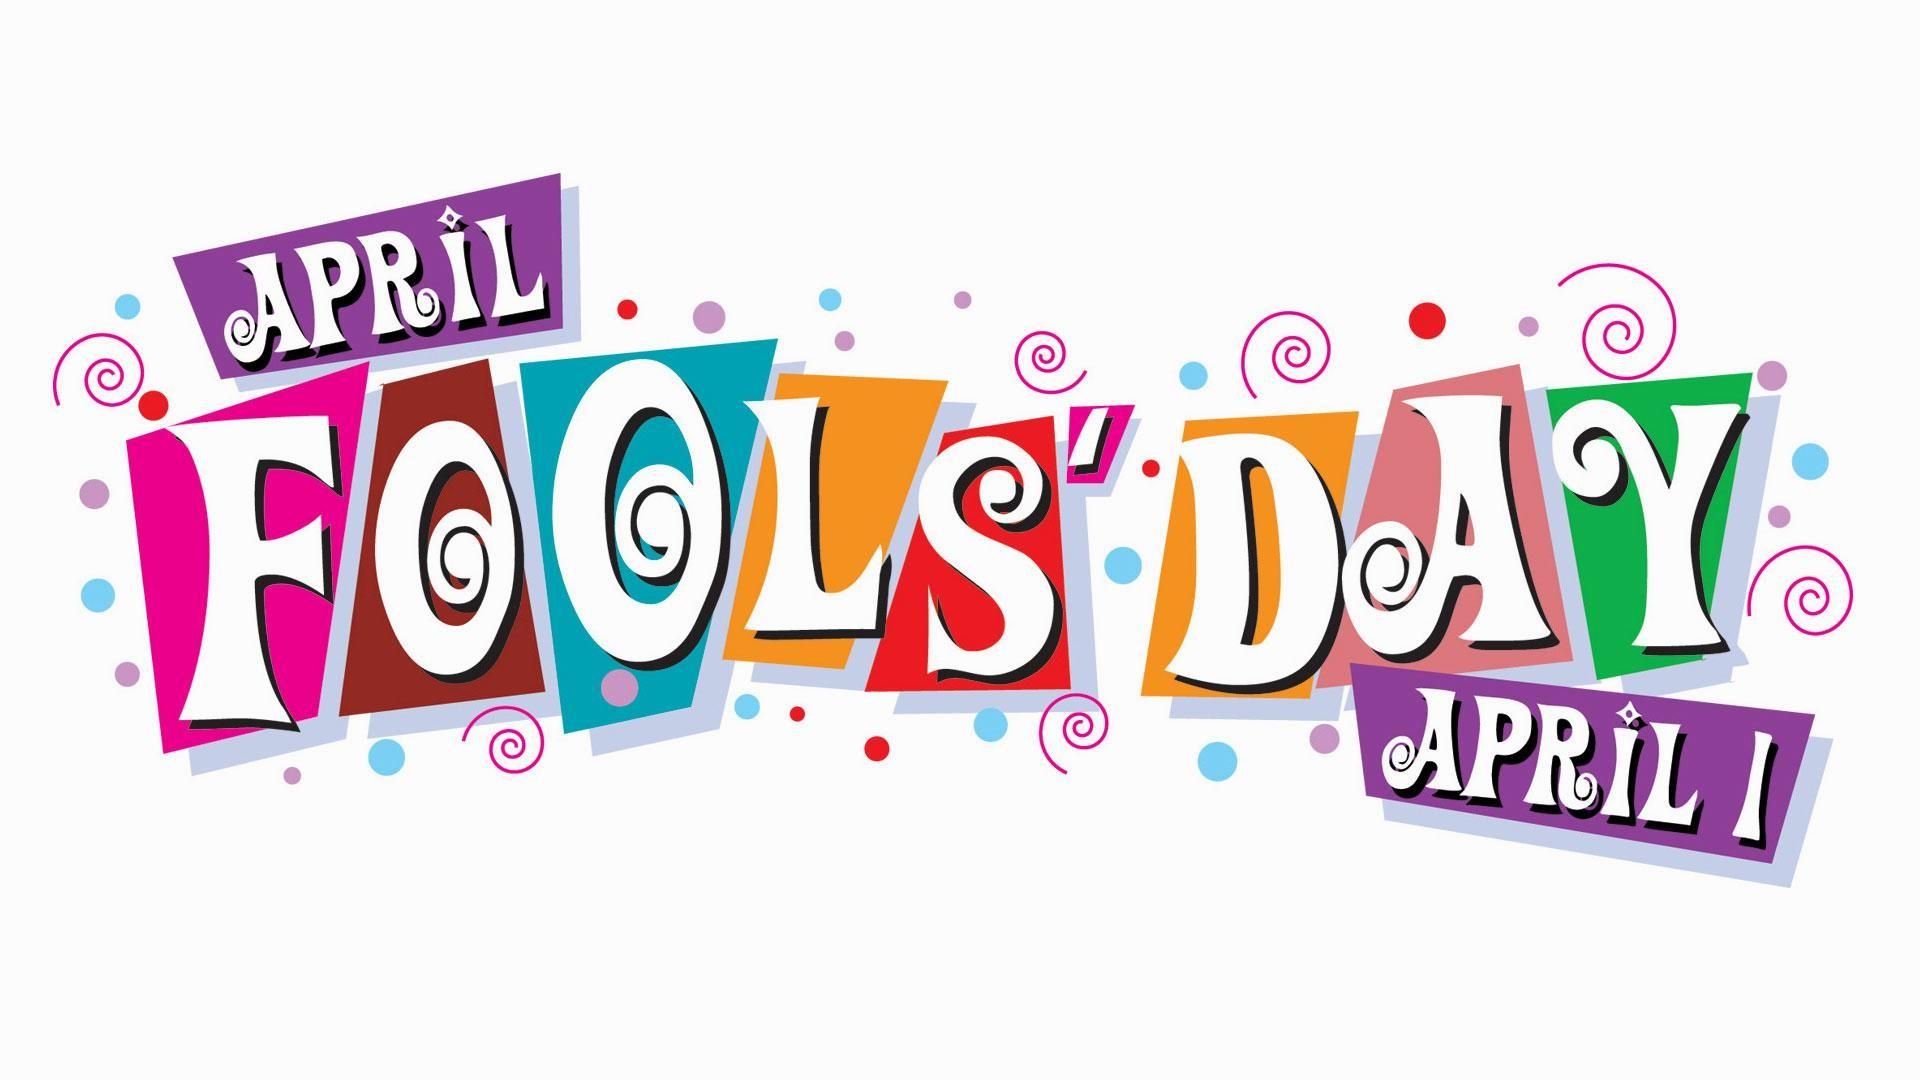 April 1 April Fools Day Digital Signage Graphic